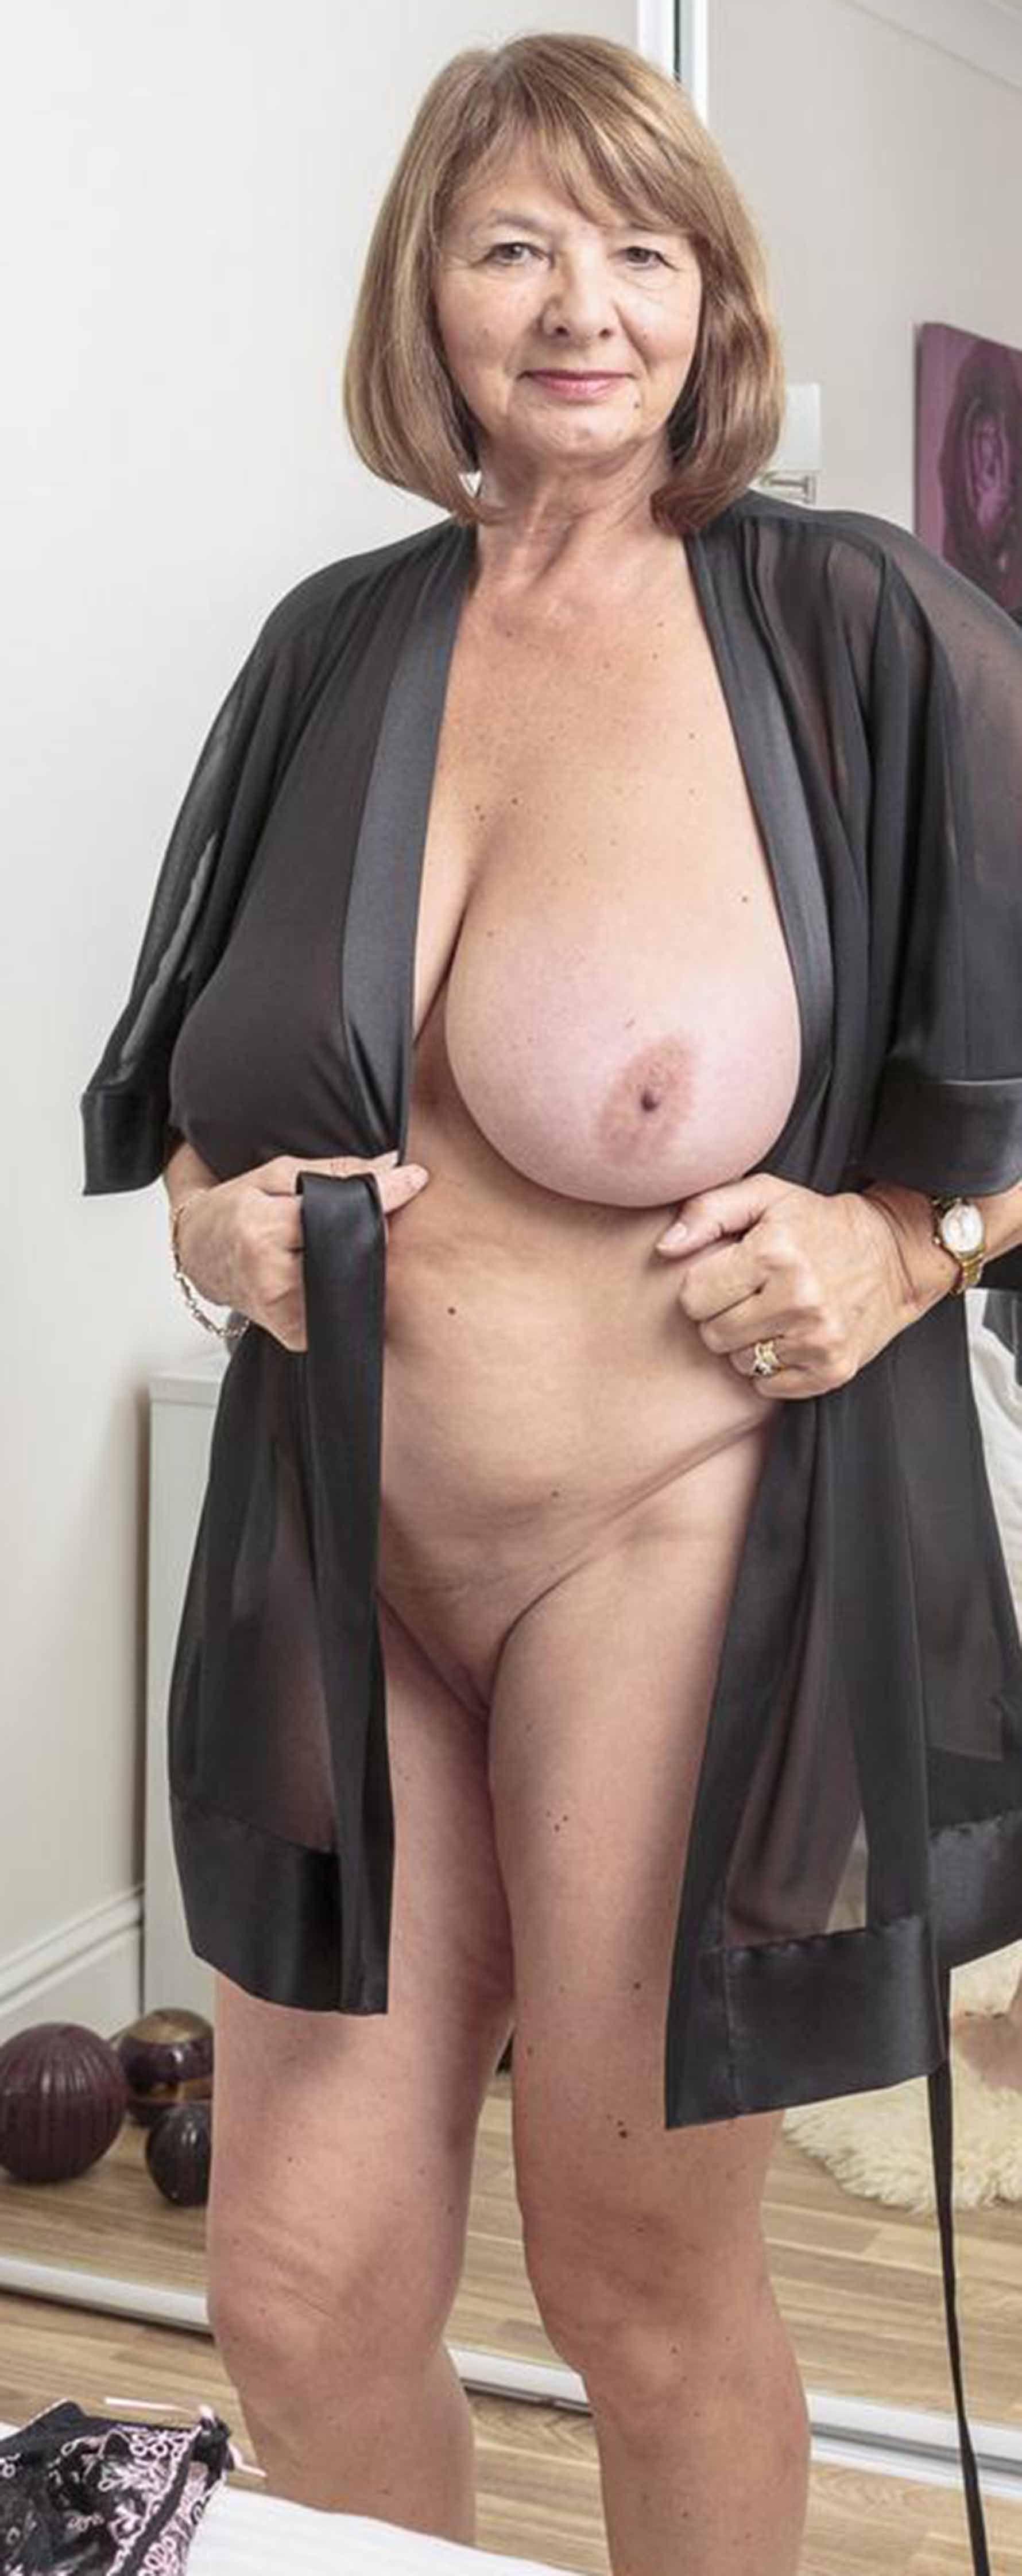 Nude Mature The Porn Lmg love them